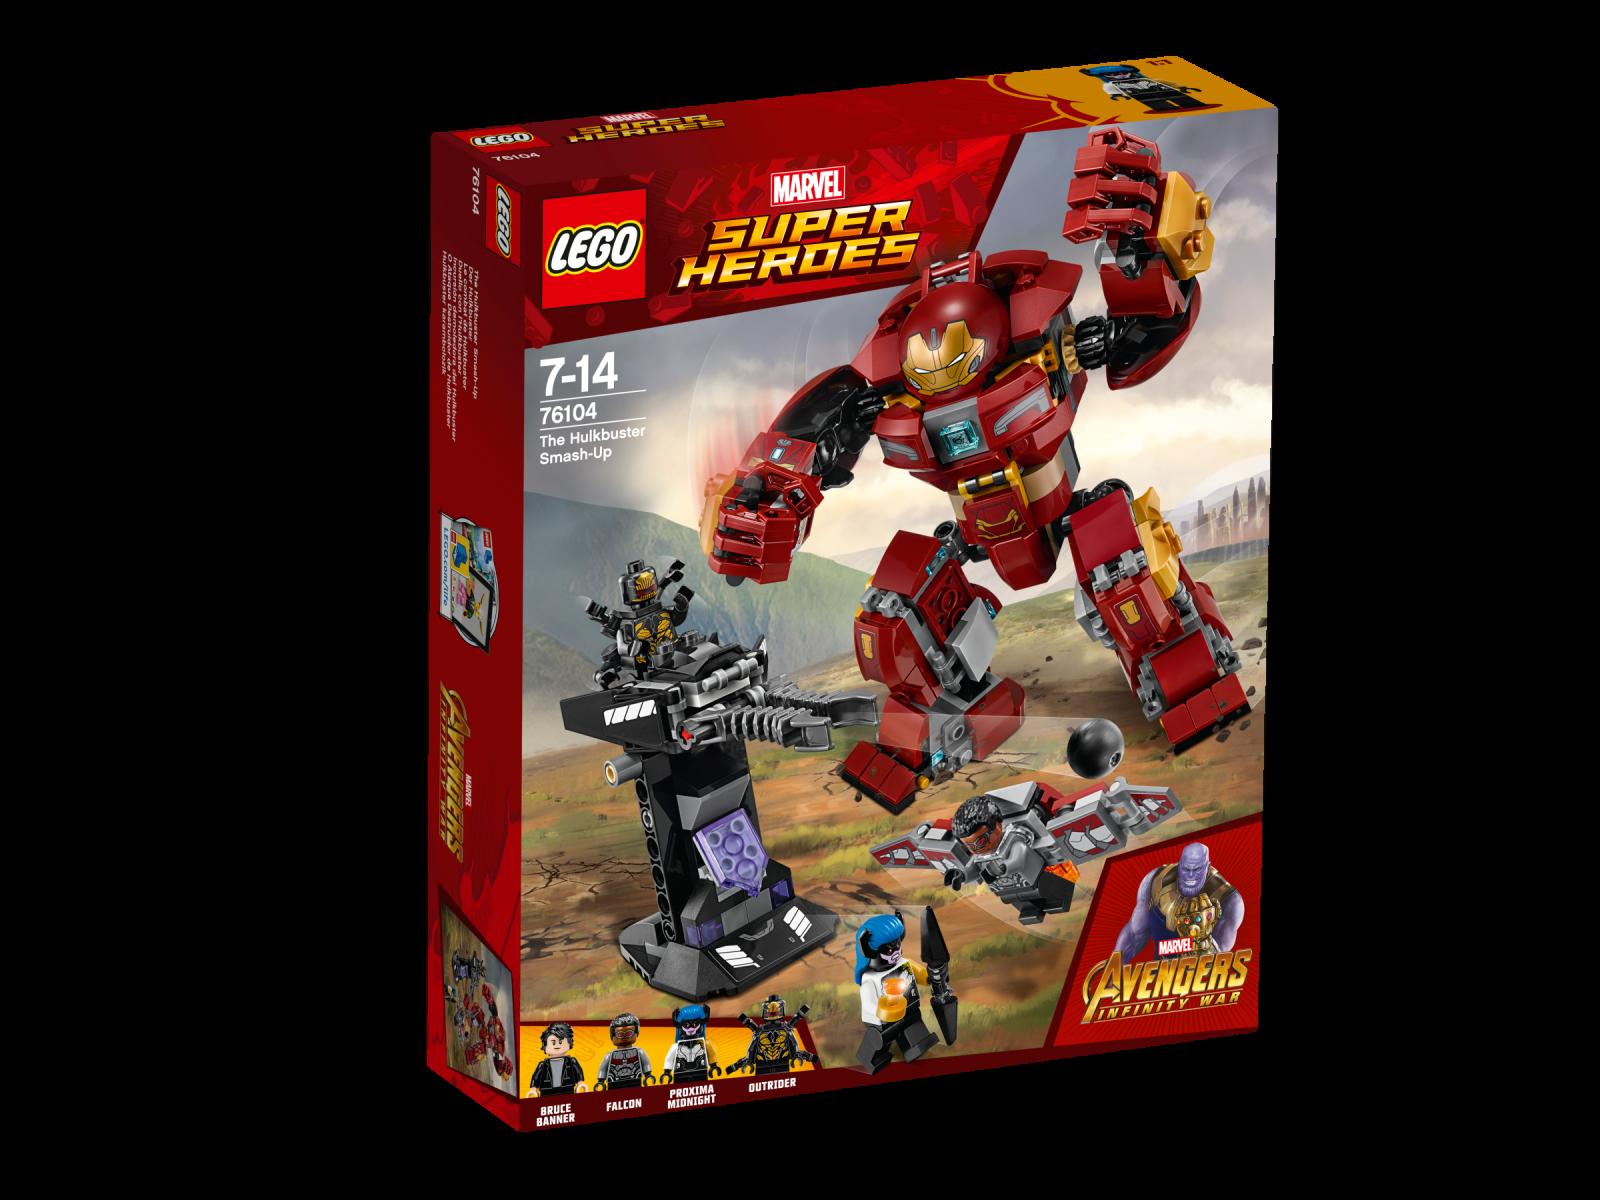 LEGO® LEGO® LEGO® Marvel Super Heroes 76104 Der Hulkbuster NEU OVP_ NEW MISB NRFB c61745